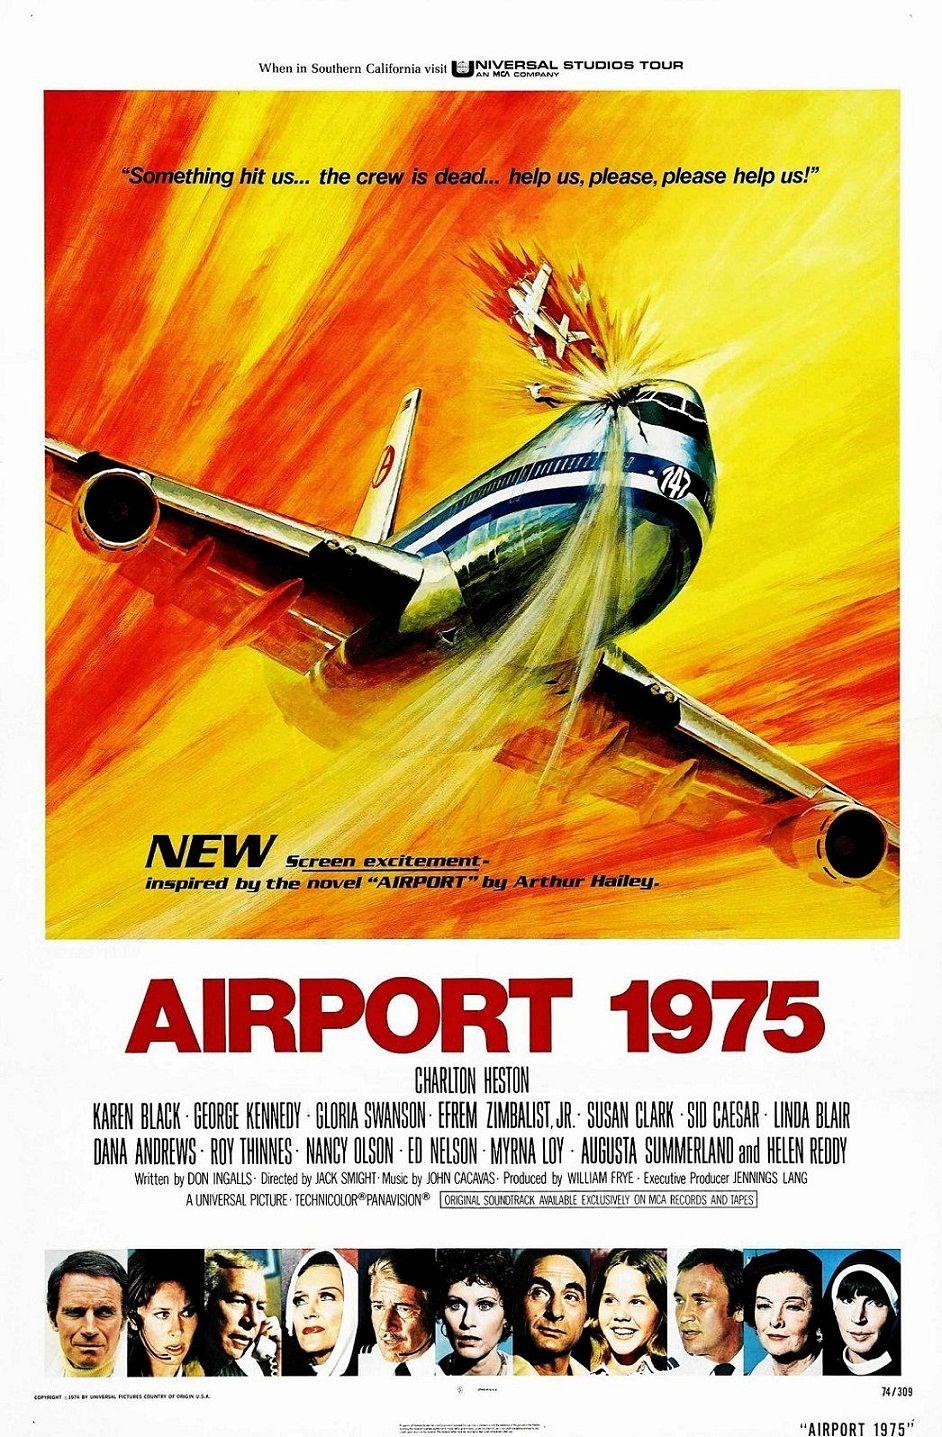 Аэропорт 1975 / Airport 1975 (1974): постер